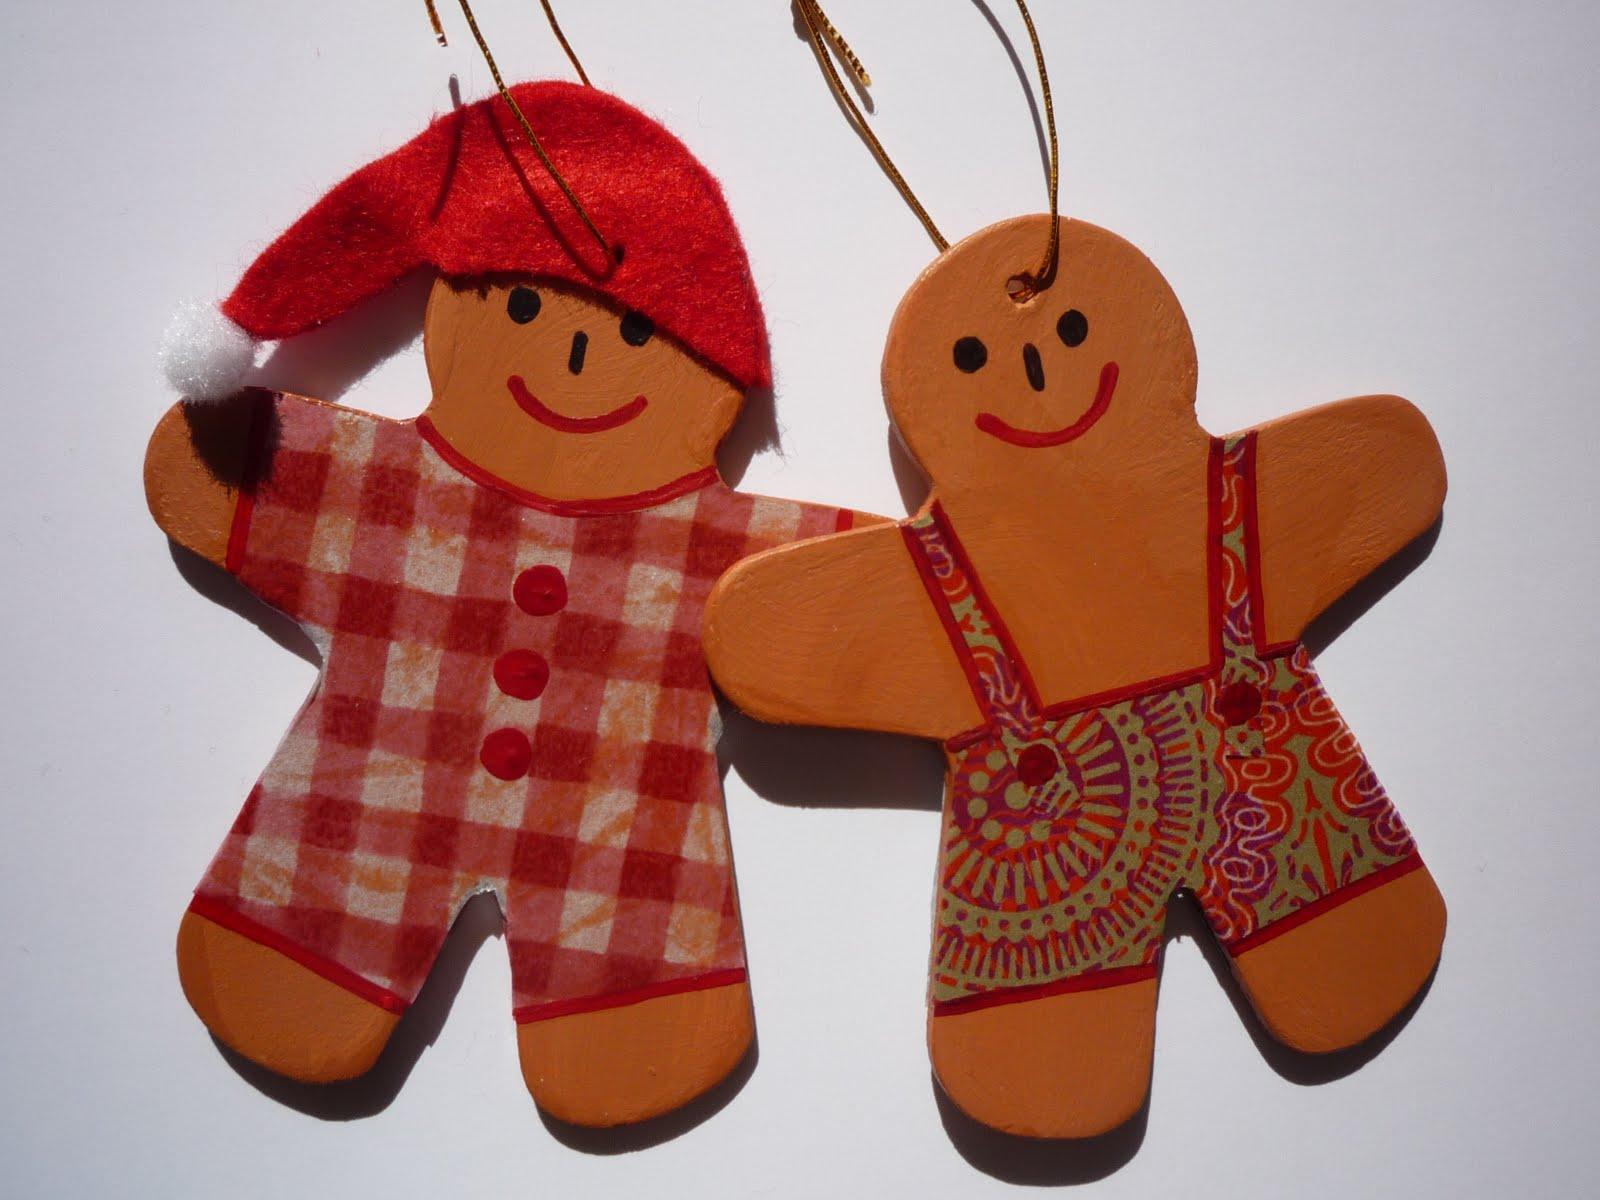 Httpart4every1blogspotcom Wooden Gingerbread Men Christmas Style